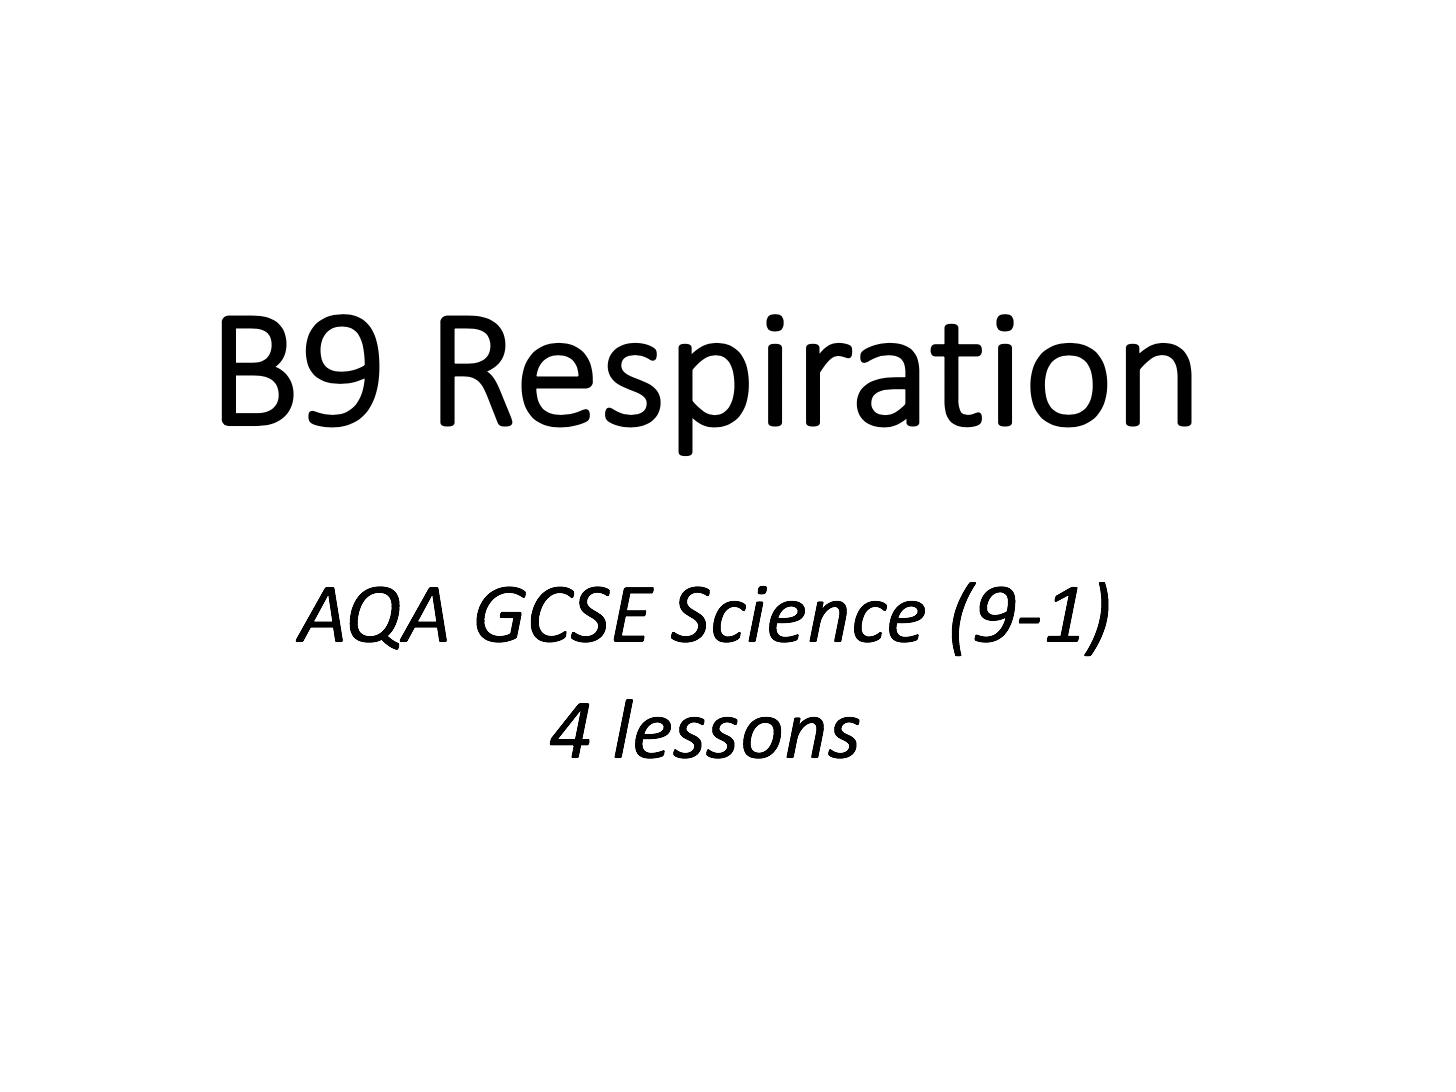 B9 Respiration